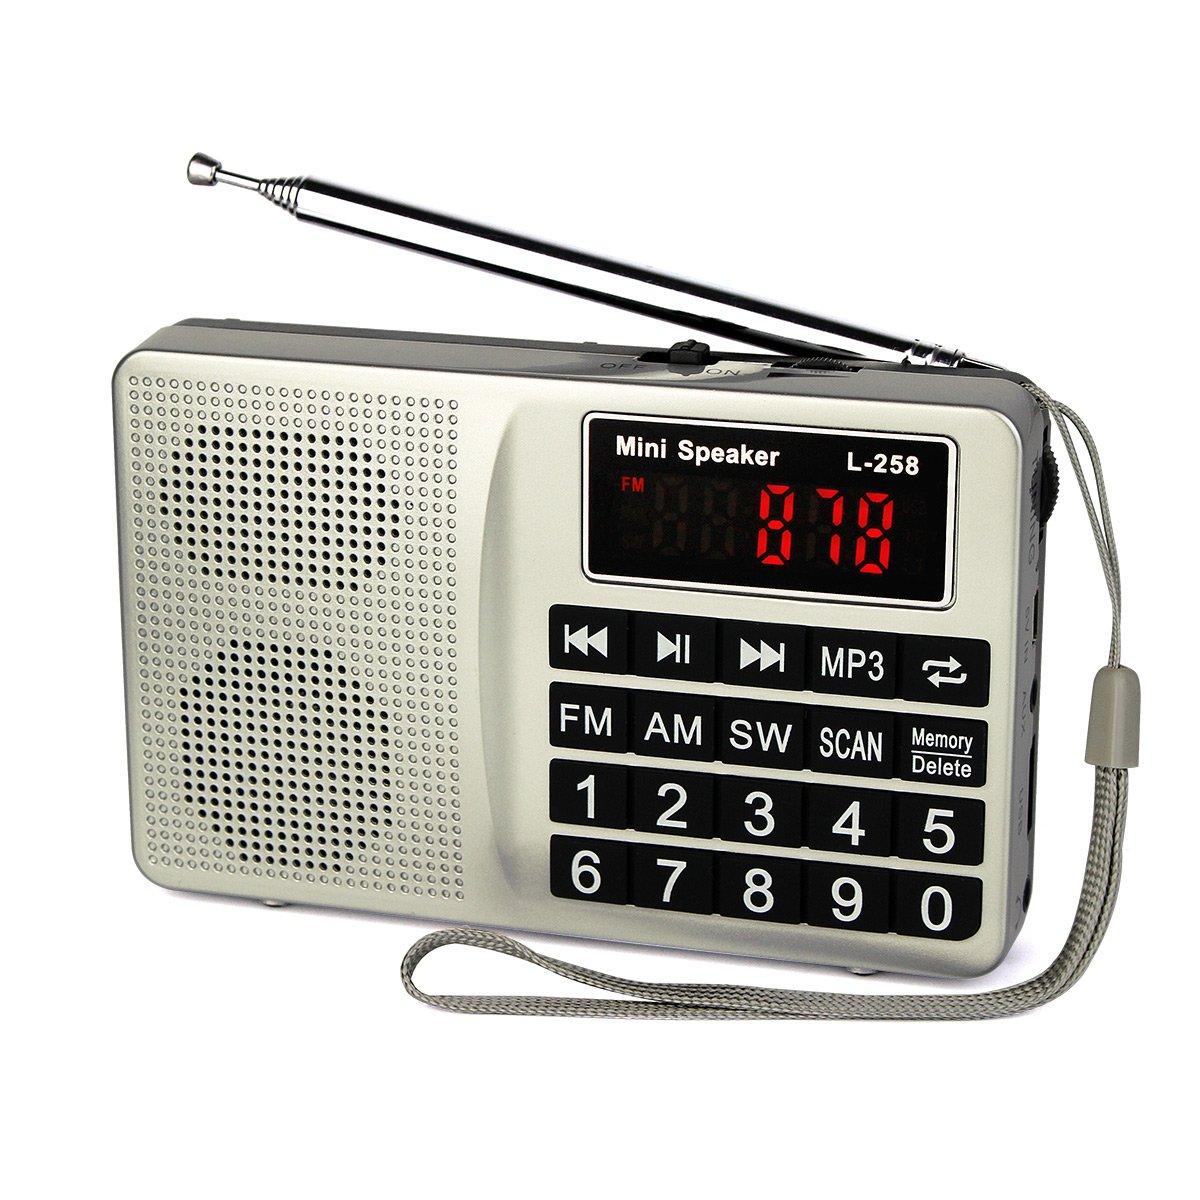 8905c7f339cf Get Quotations · TIVDIO L-258 Portable Digital Shortwave Transistor Radio  with AM FM Micro-SD Card